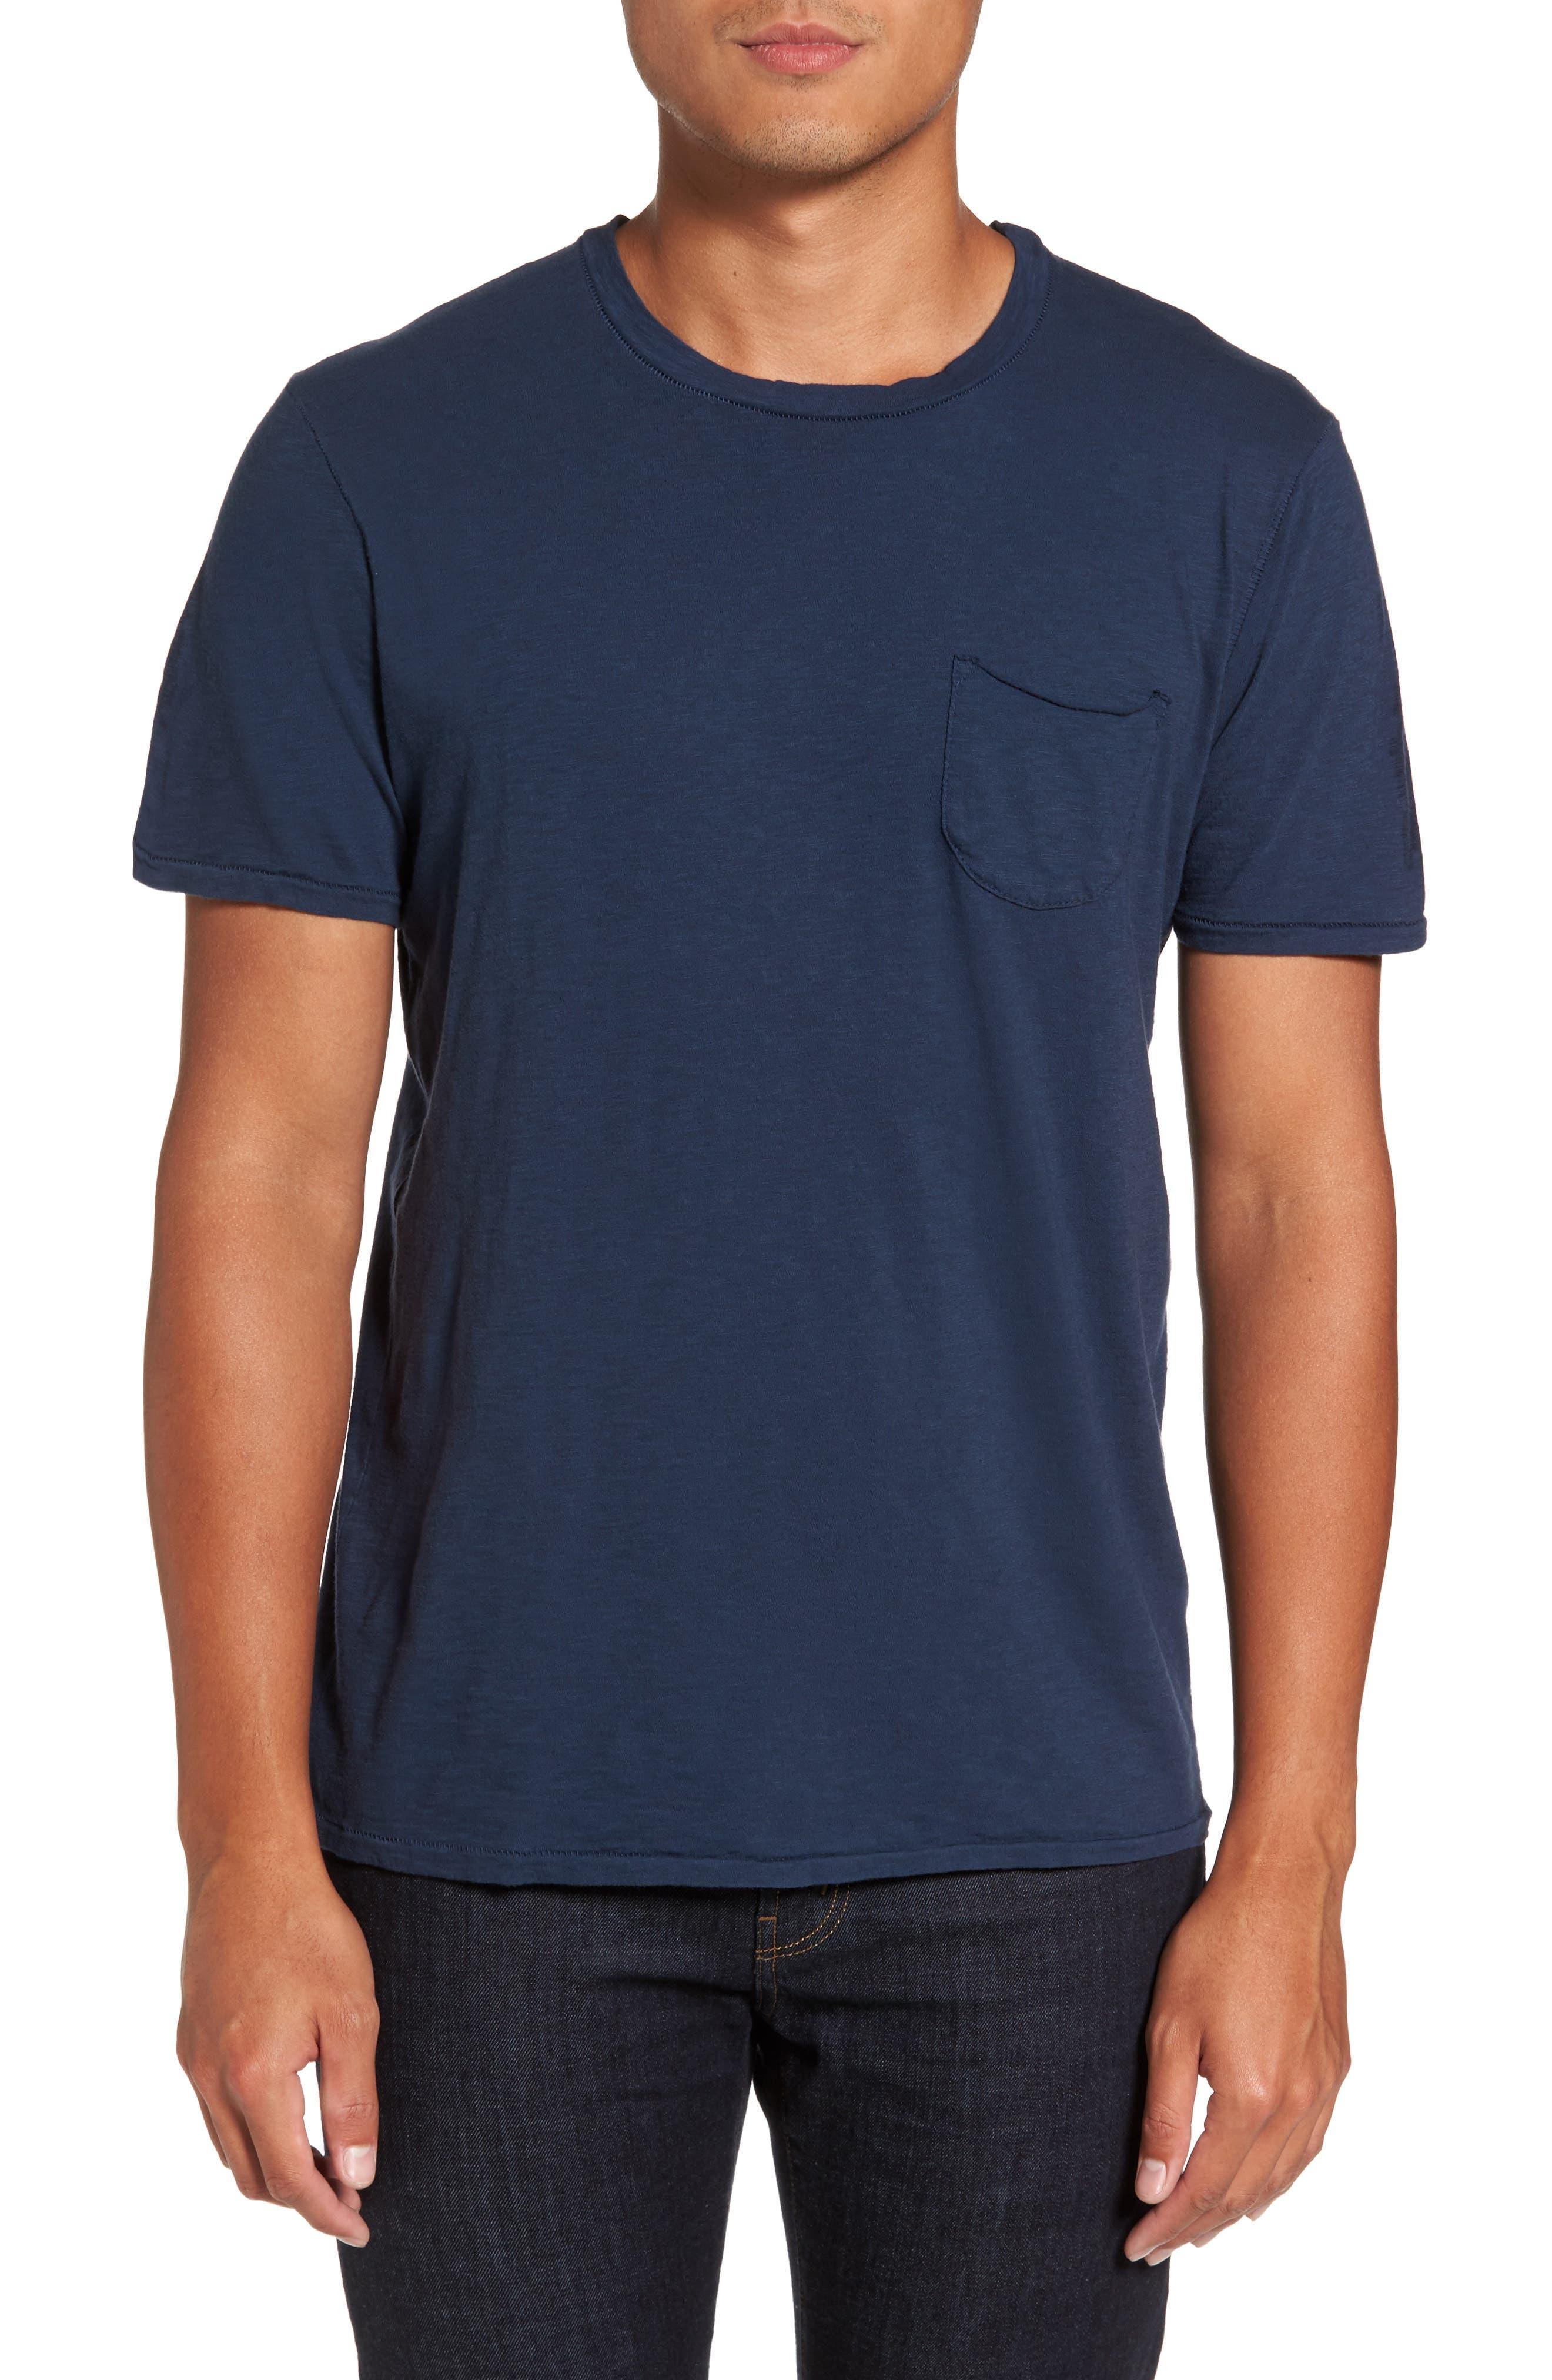 JOES Chase Classic Crewneck T-Shirt